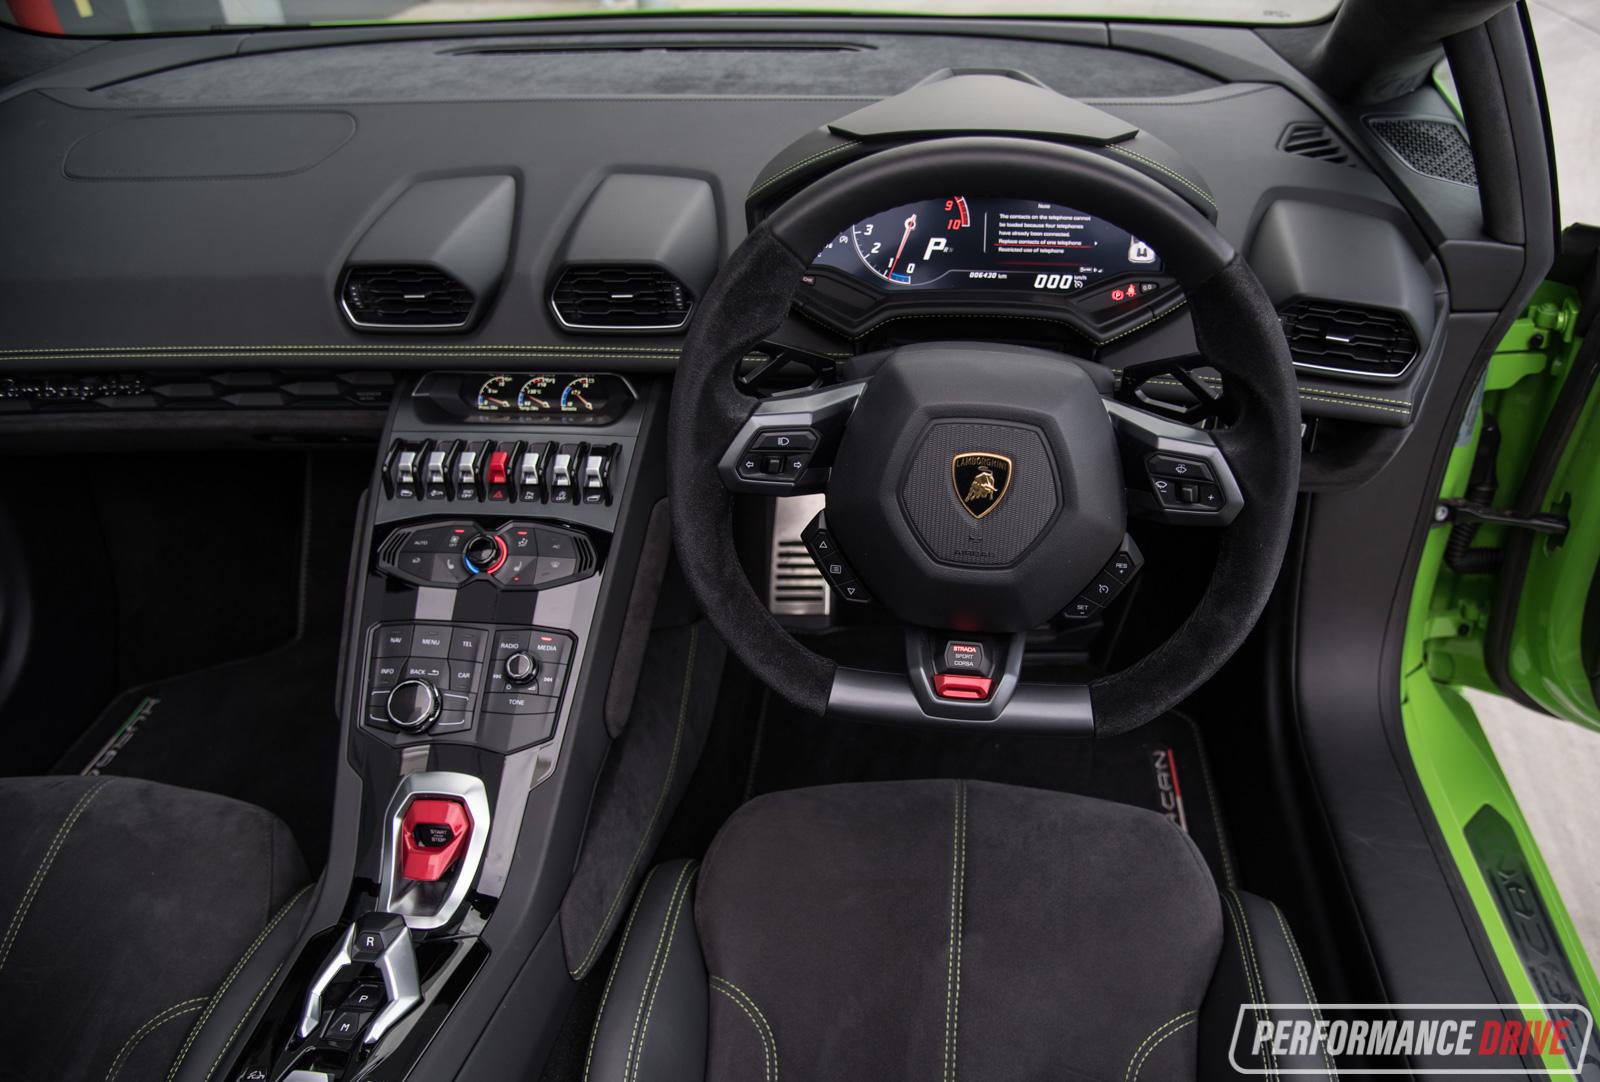 2016 Lamborghini Huracan Spyder Review Video Performancedrive